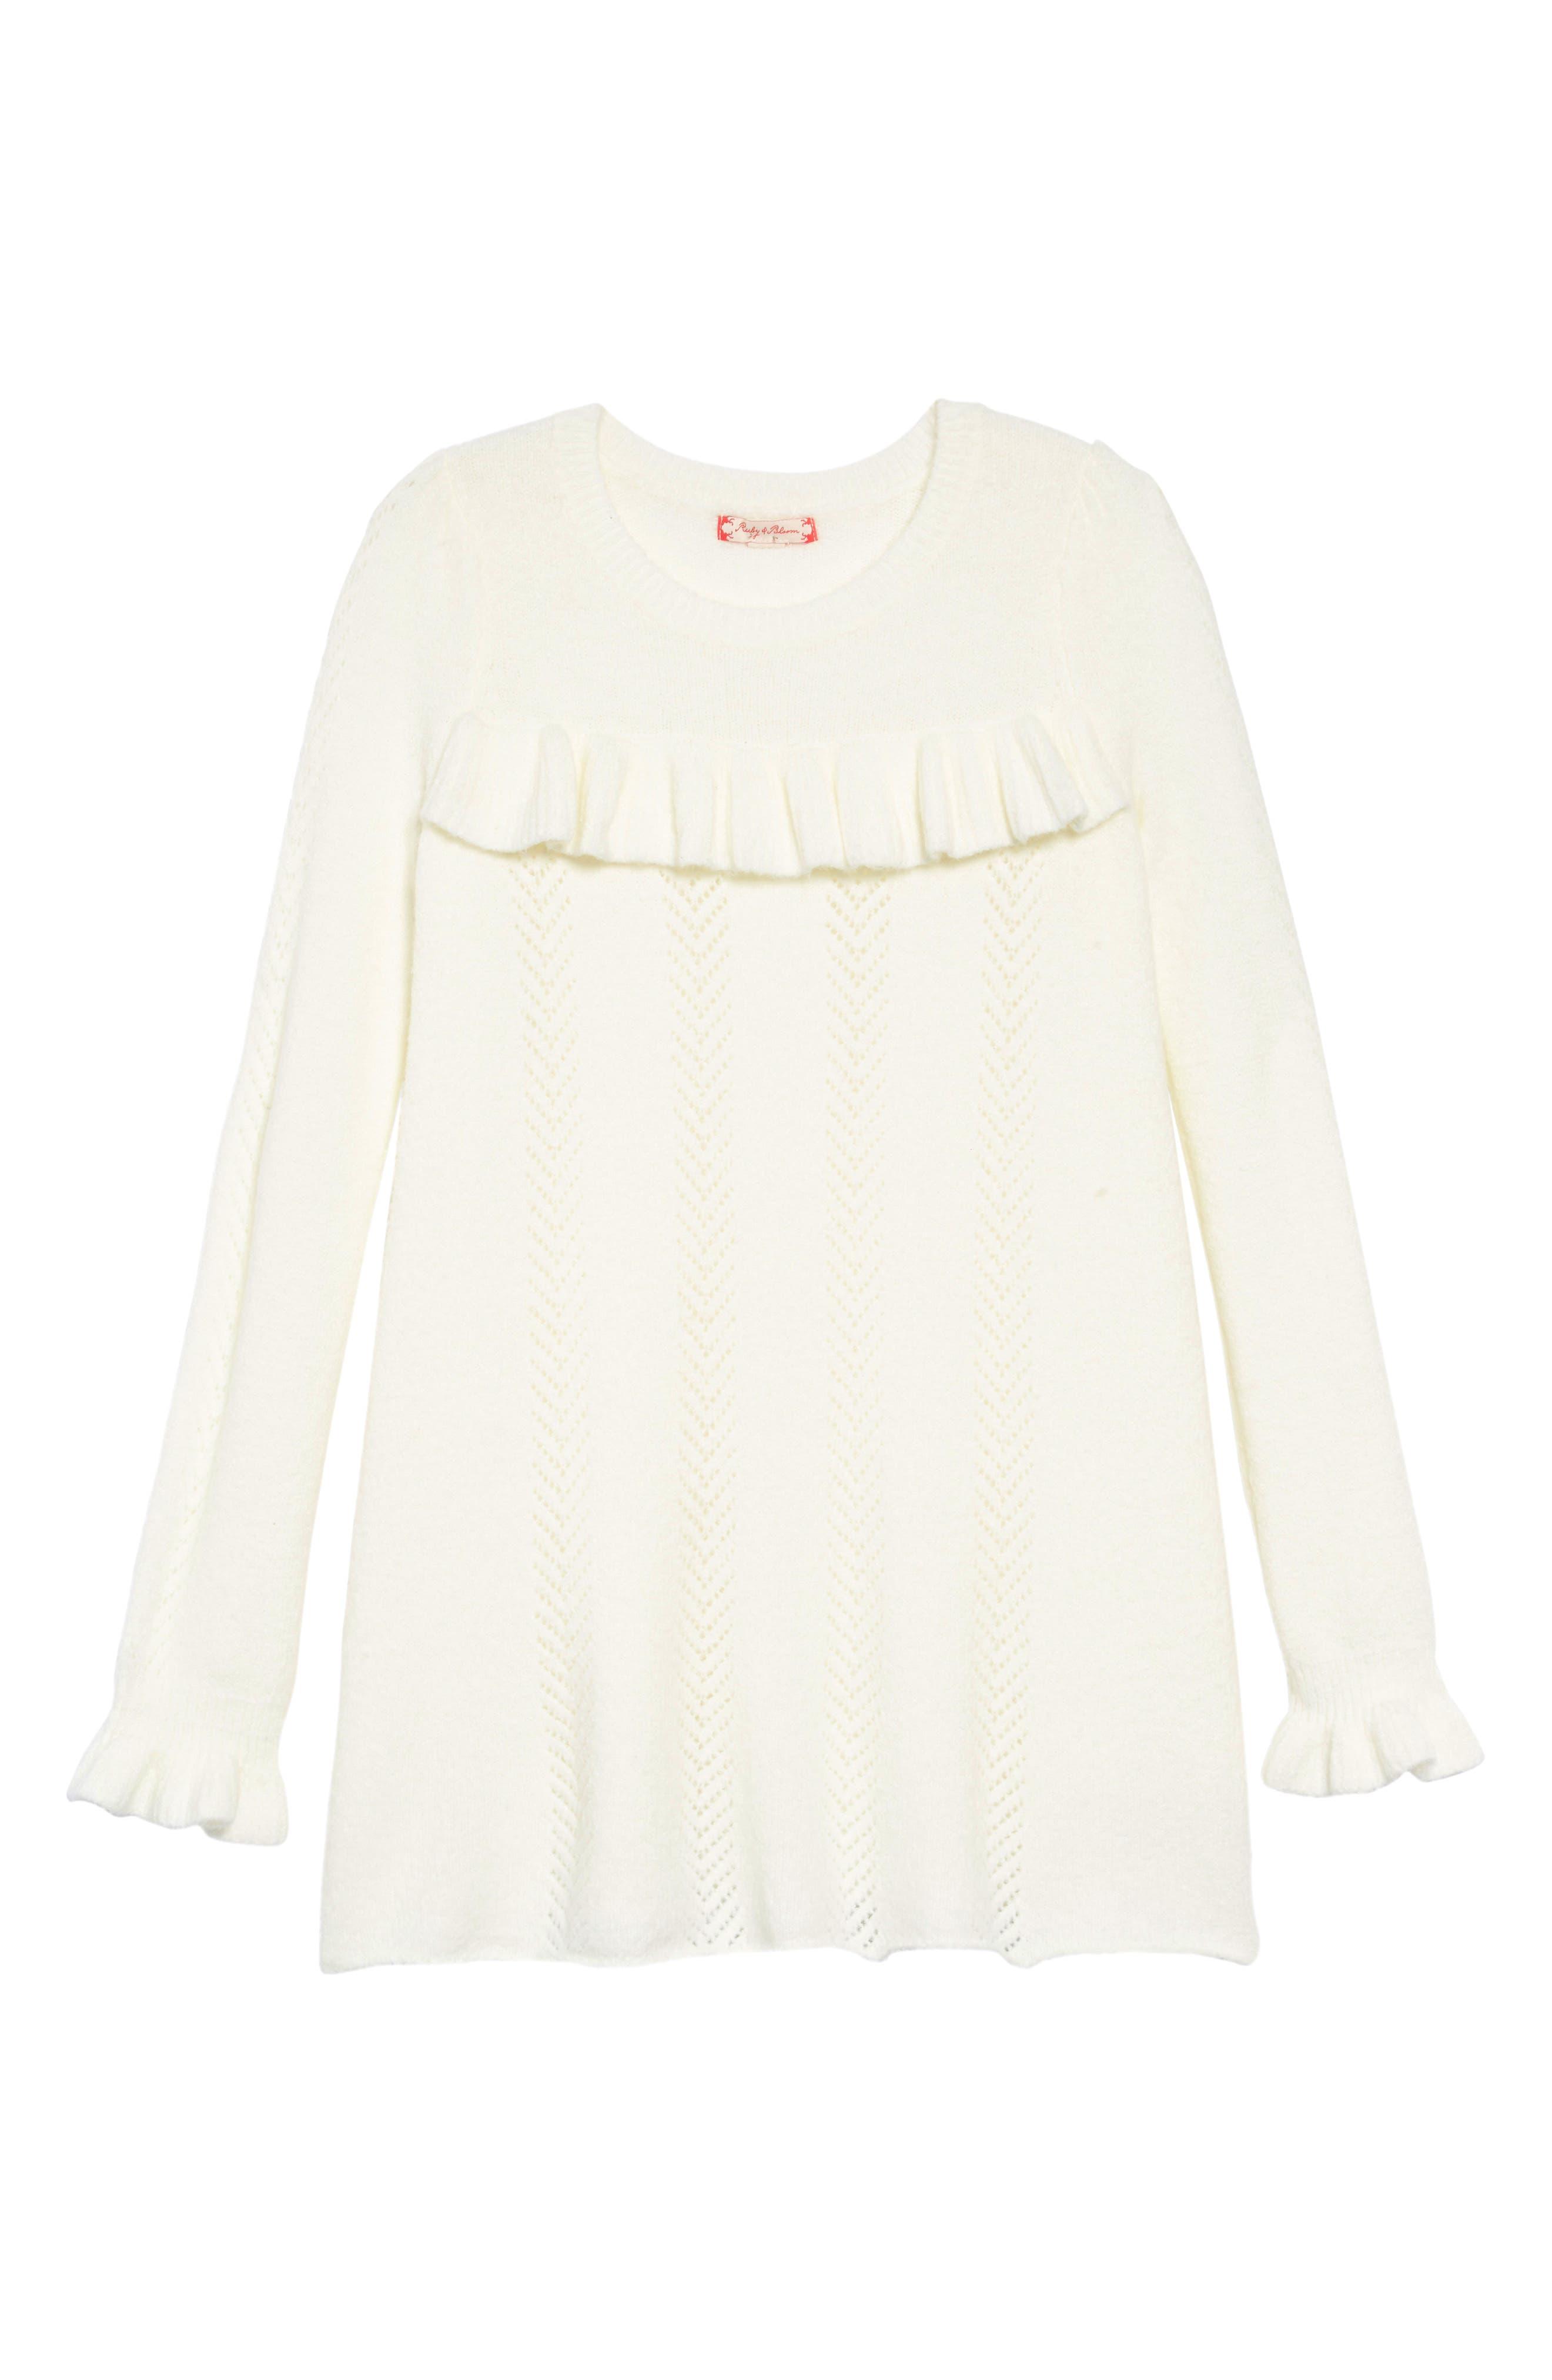 Pointelle Sweater Dress,                             Main thumbnail 1, color,                             IVORY EGRET